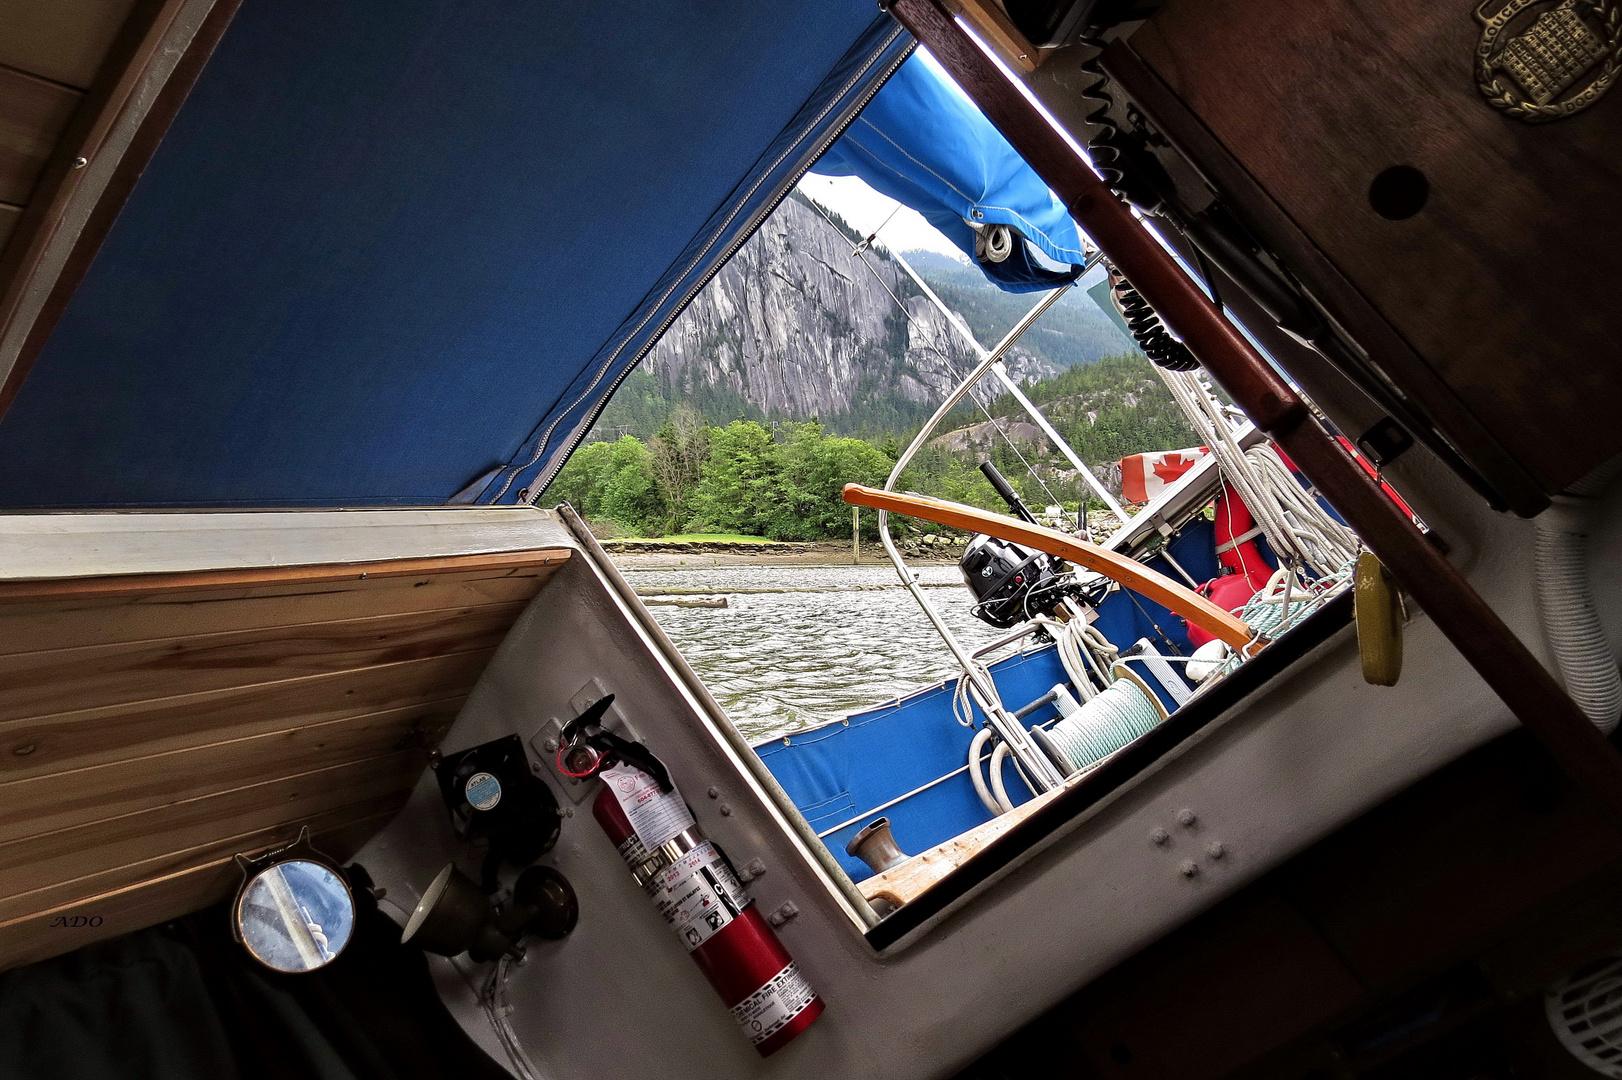 Our Sailboat and the Sandbar